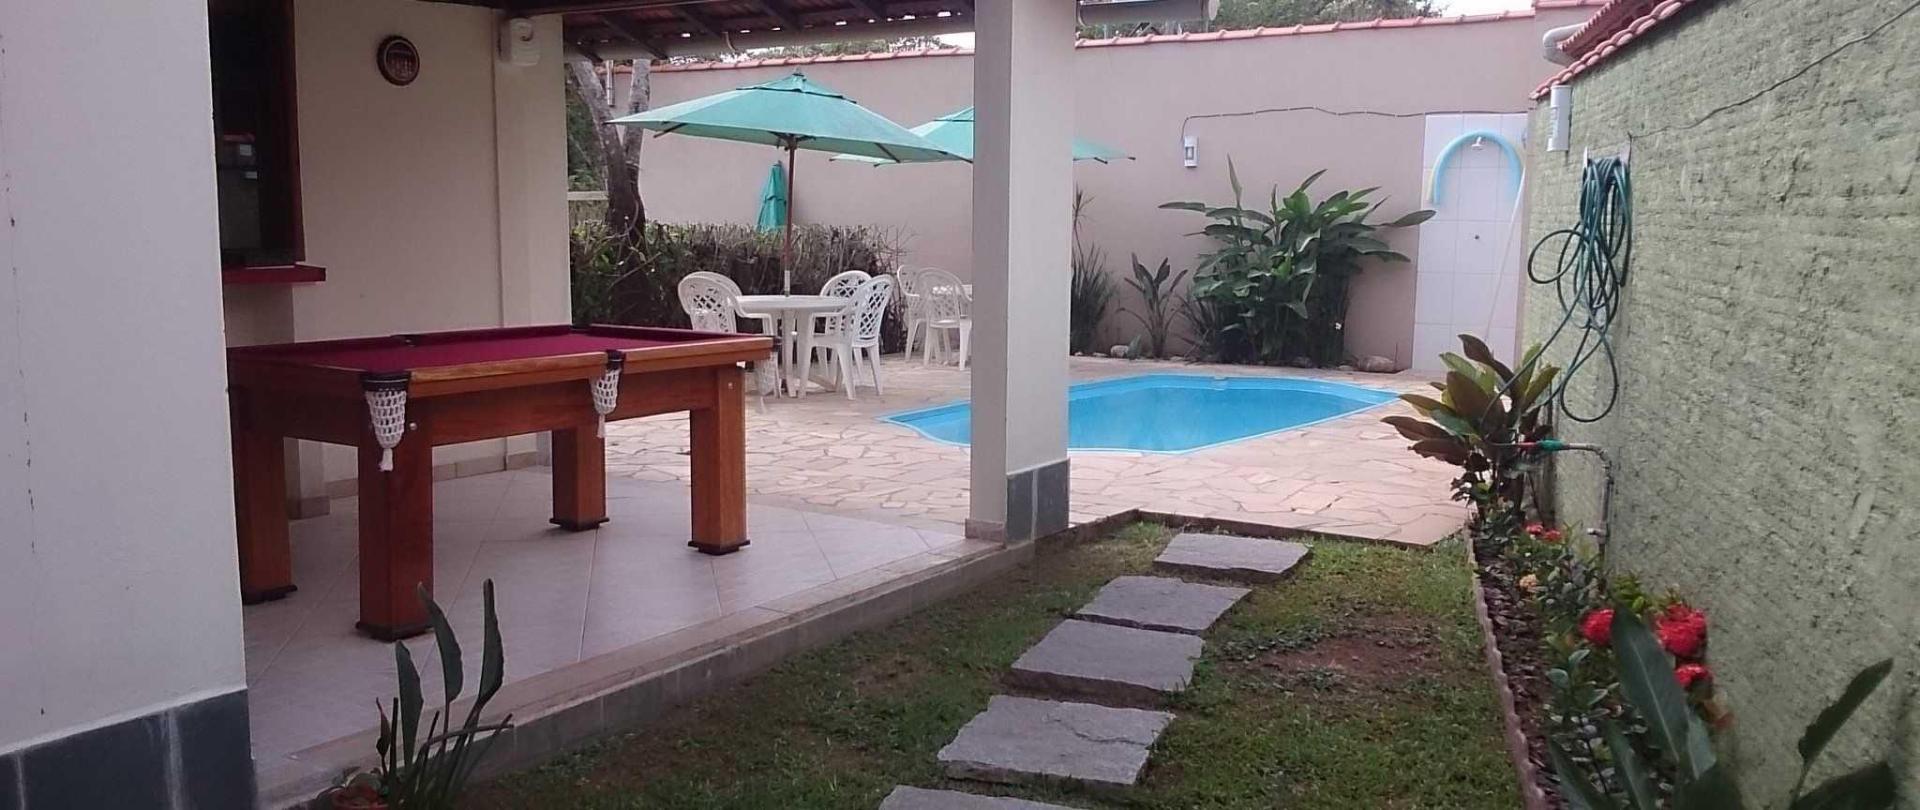 lateral-piscina-ii.jpg